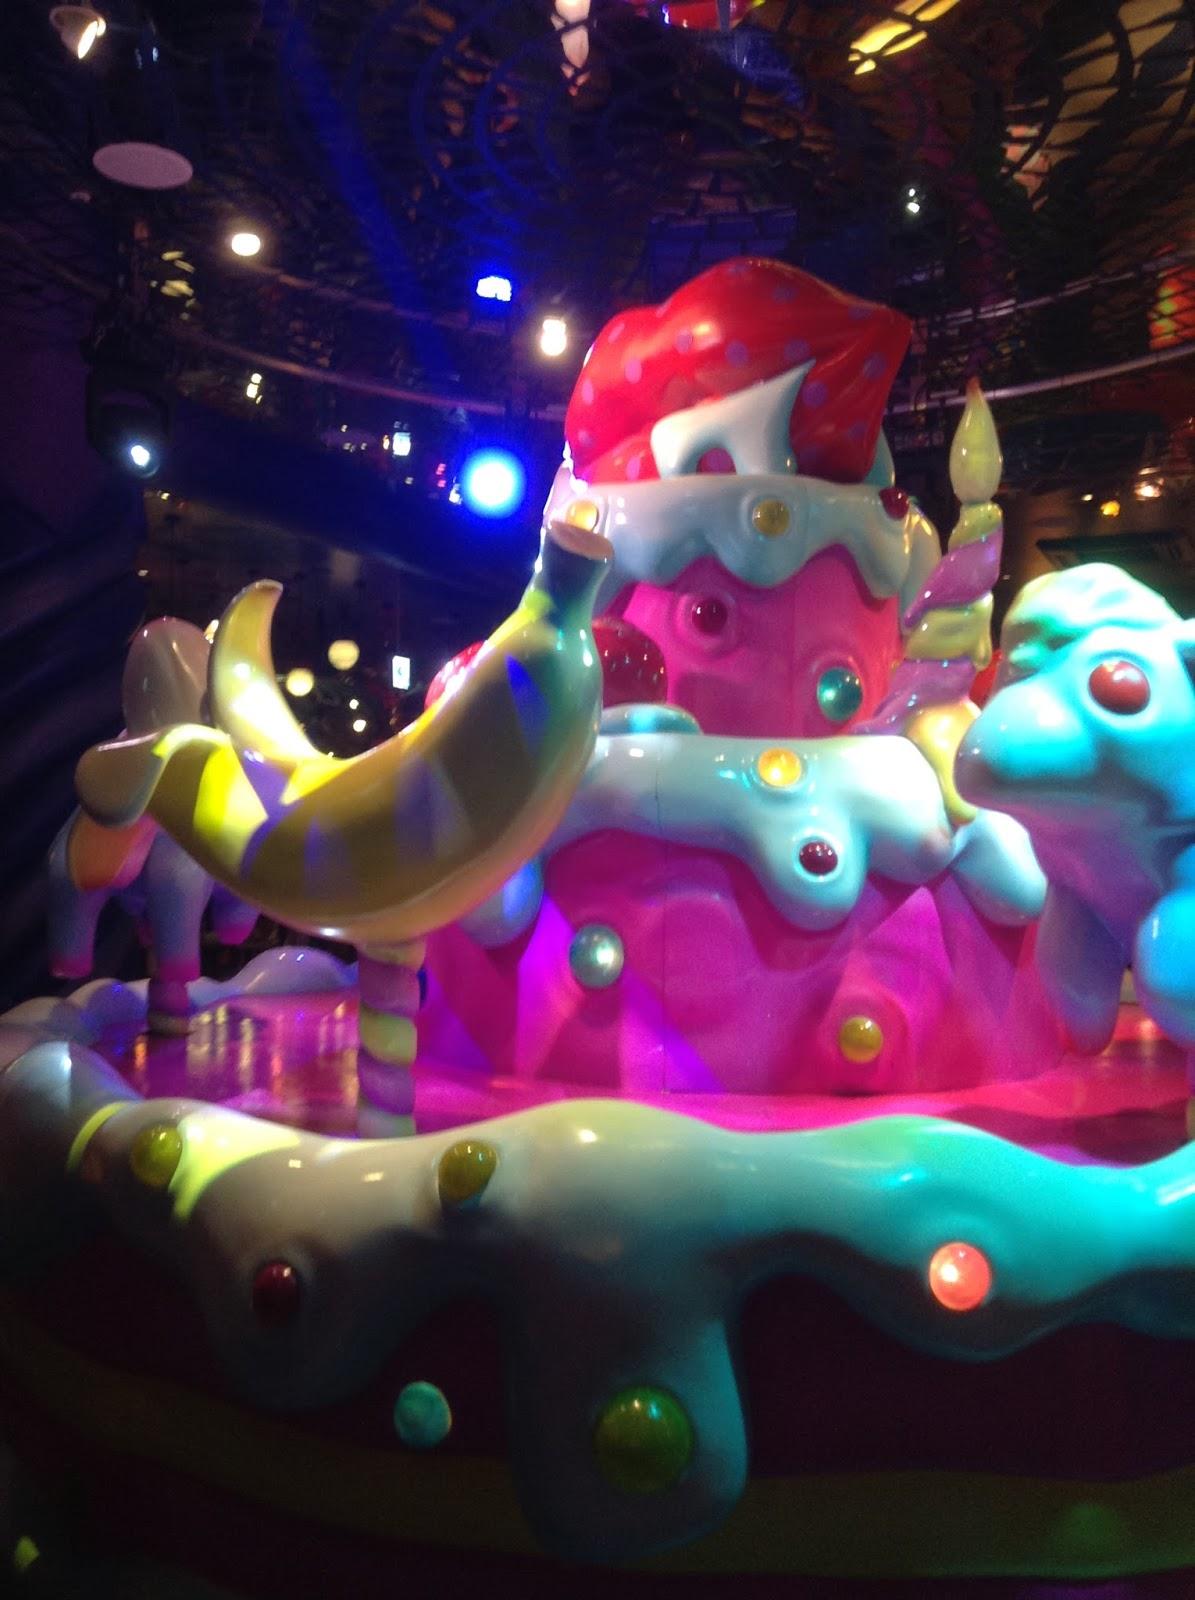 Kawaii Merry go round